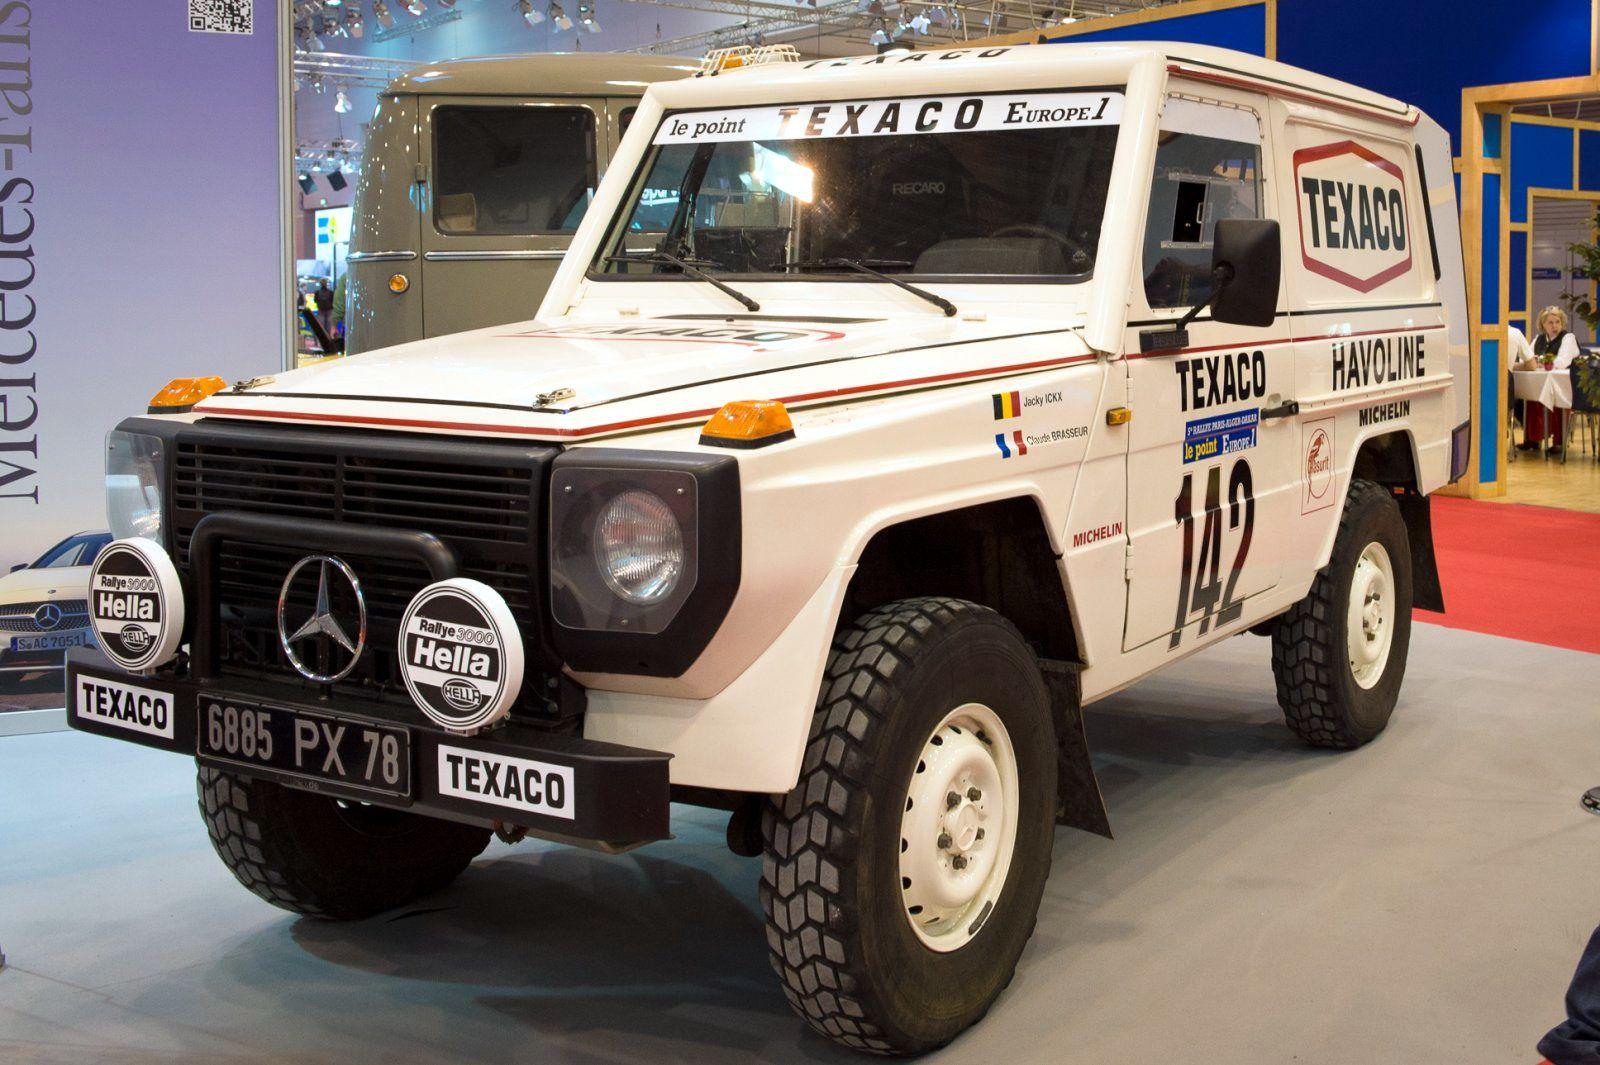 Mercedes benz 280 ge swb w460 1979 01 1990 pictures to pin - Mercedes Benz 280ge Paris Dakar Rally Car